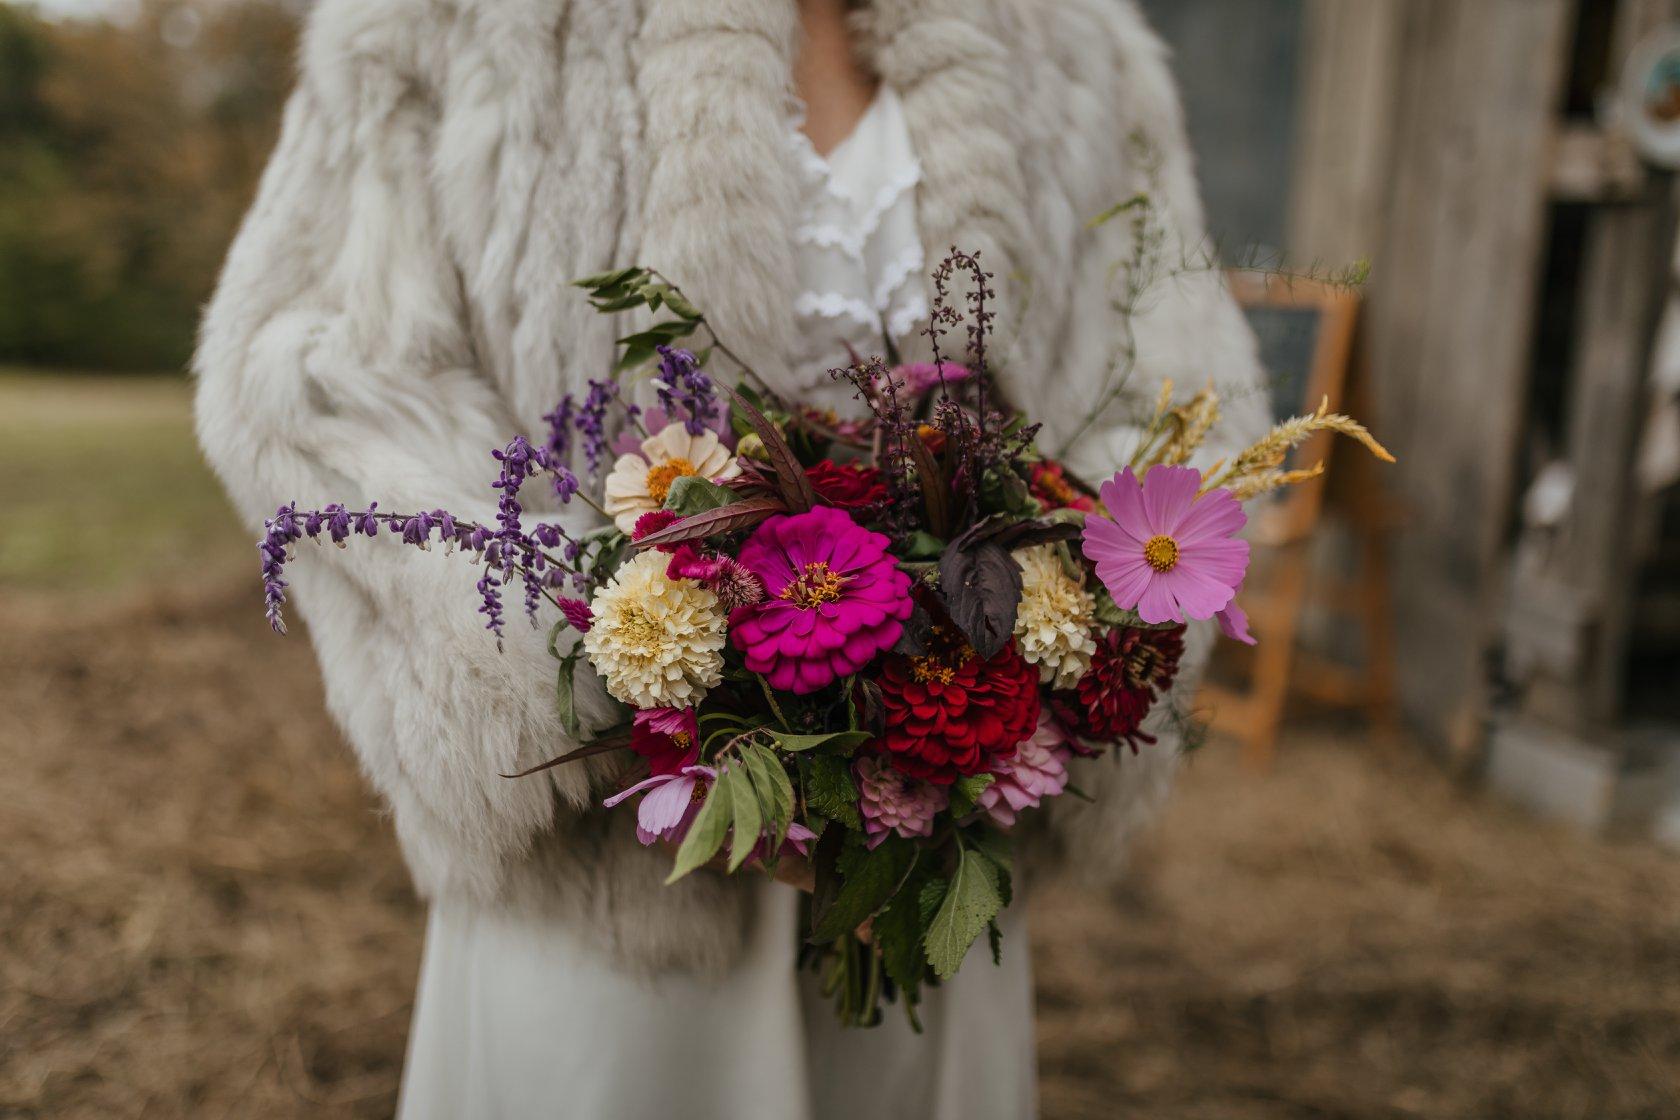 lauras bouquet.jpg